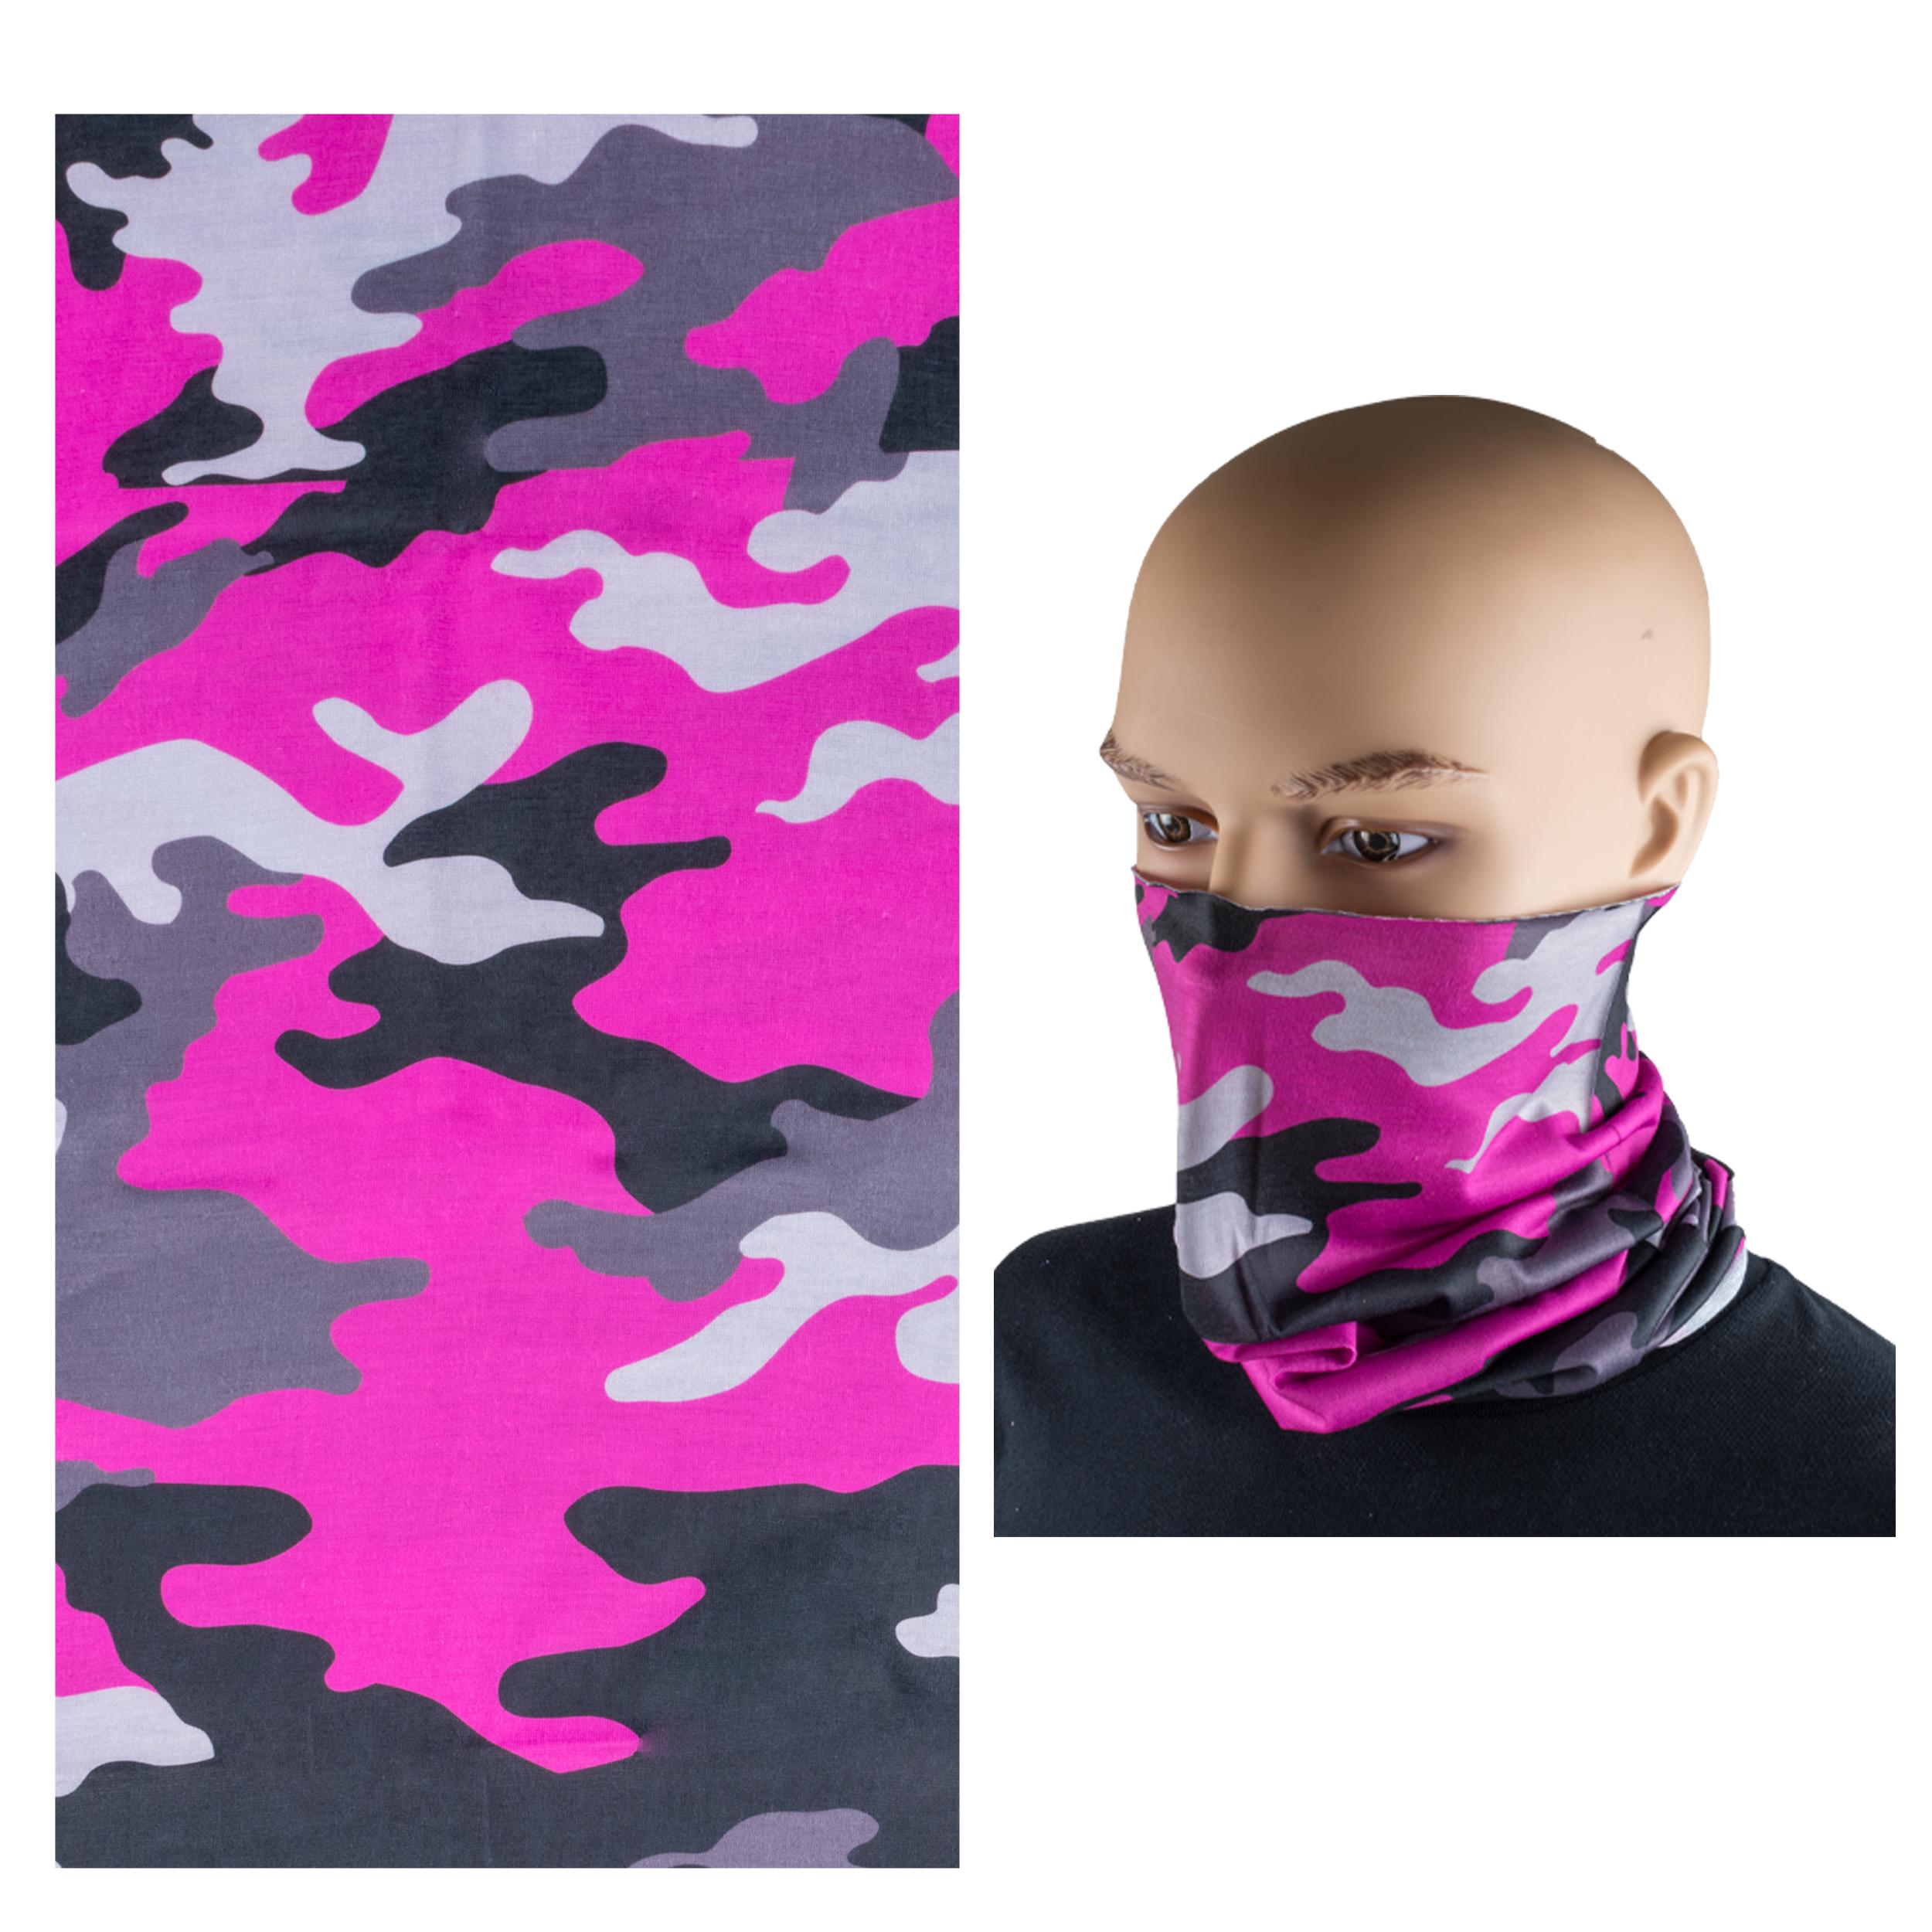 Neck Gaiter 3 Pack - Pretty in Pink